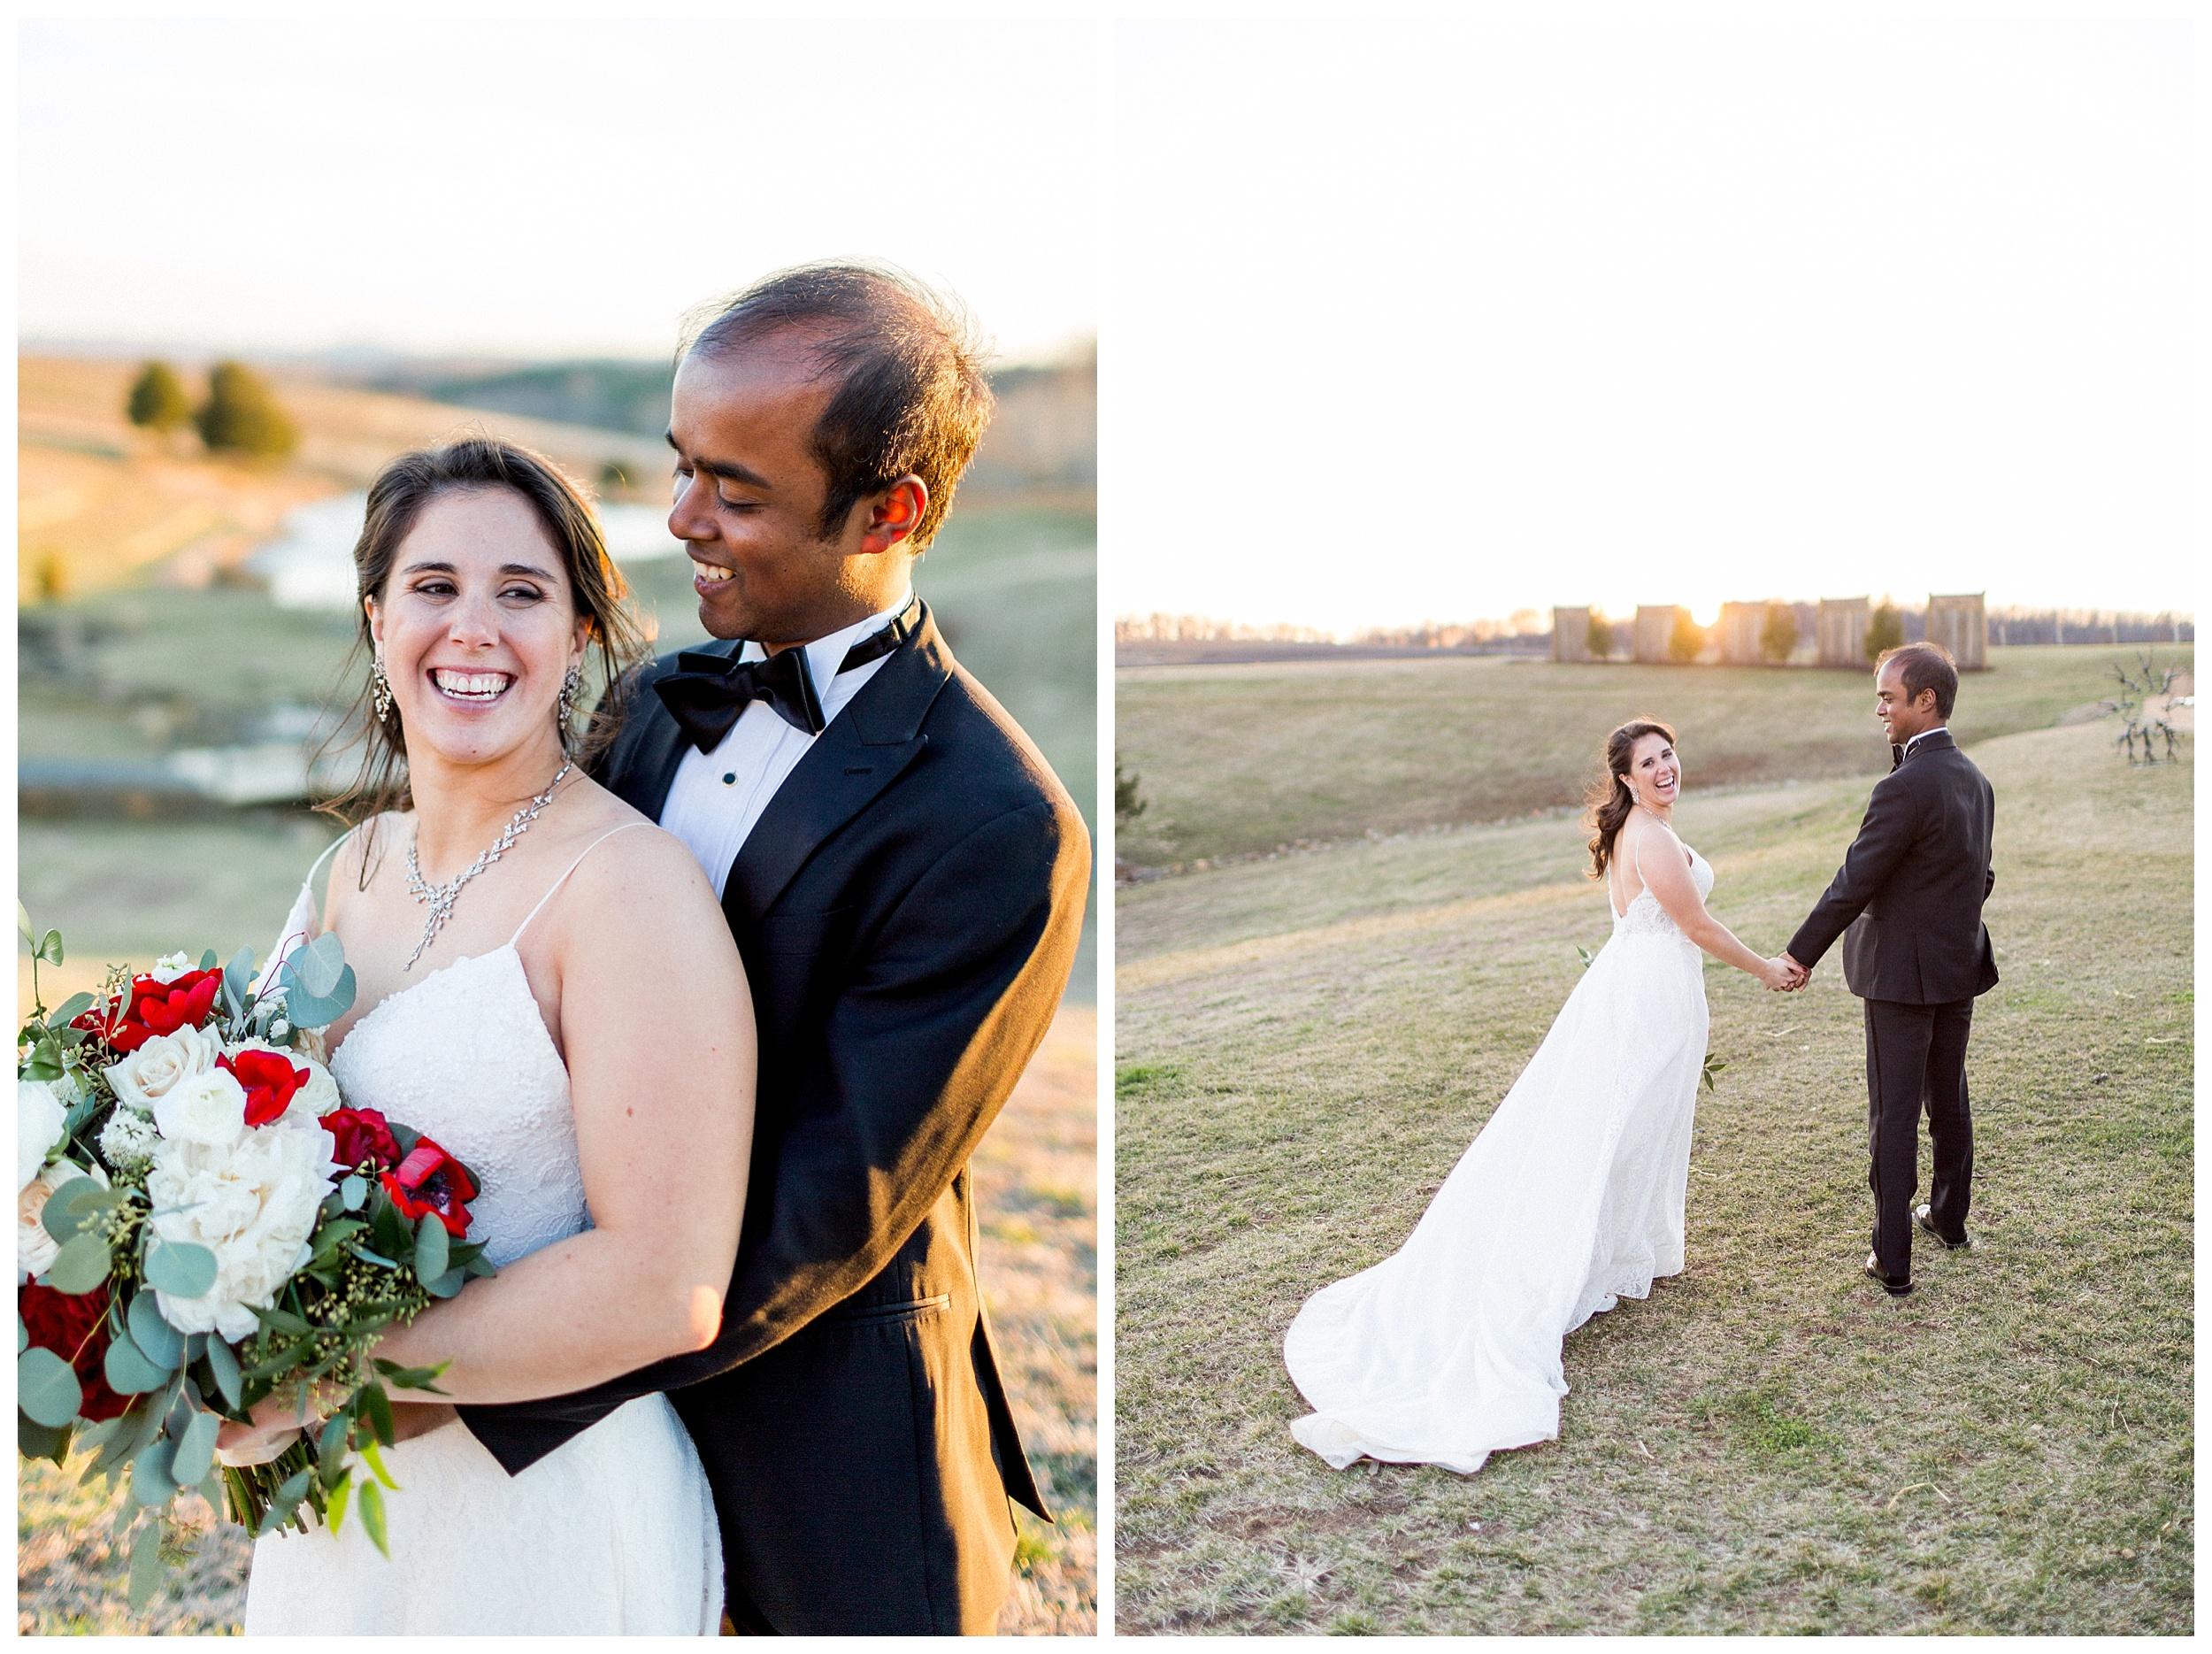 Stone Tower Winery Wedding | Virginia Winter Wedding | VA Wedding Photographer Kir Tuben_0101.jpg